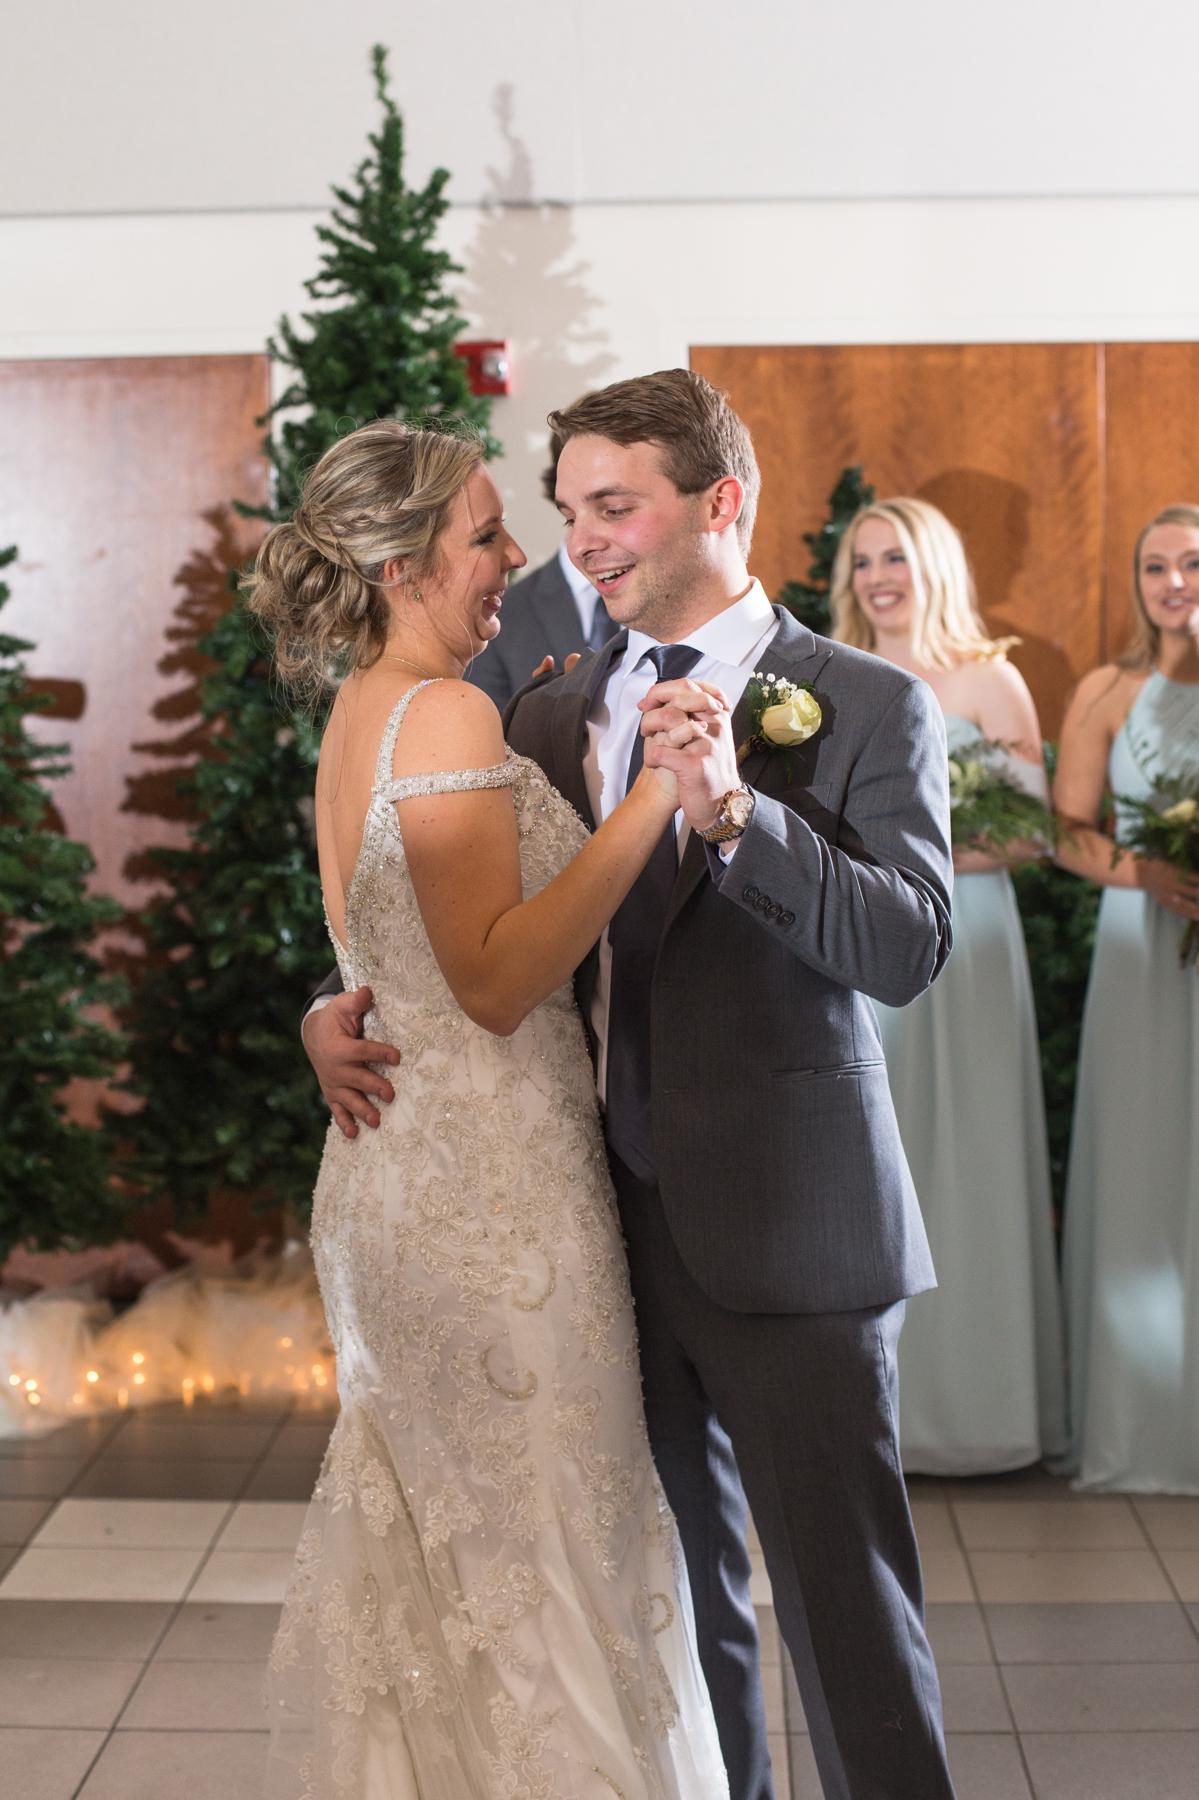 Kelli-and-Matt-Nashville-Wedding-Sneak-Peak-0269.jpg